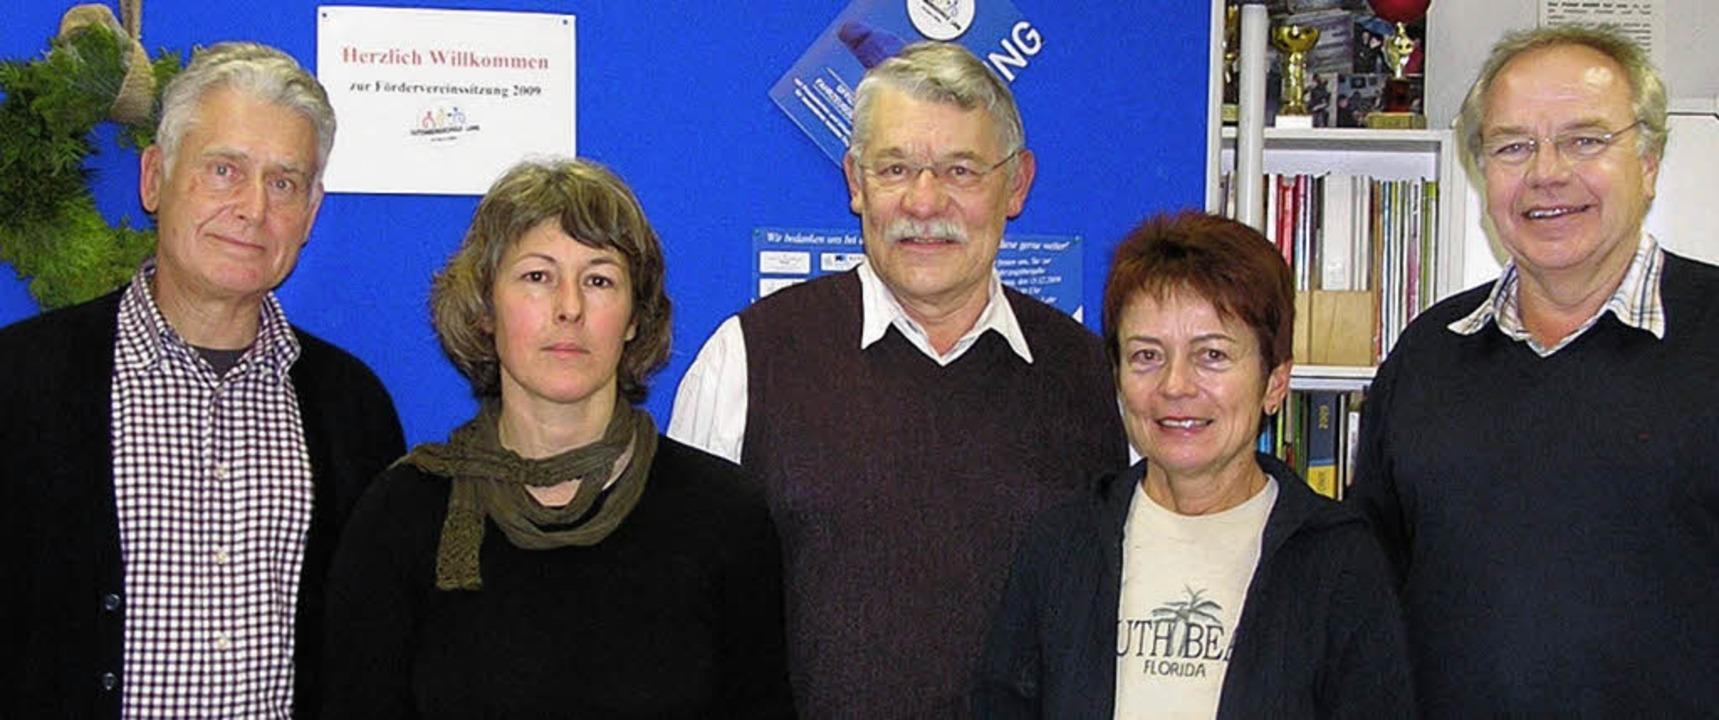 Vorstand der Freunde der Gutenbergschu...der, Hana Haakshorst,  Ernst Heidinger  | Foto: beck